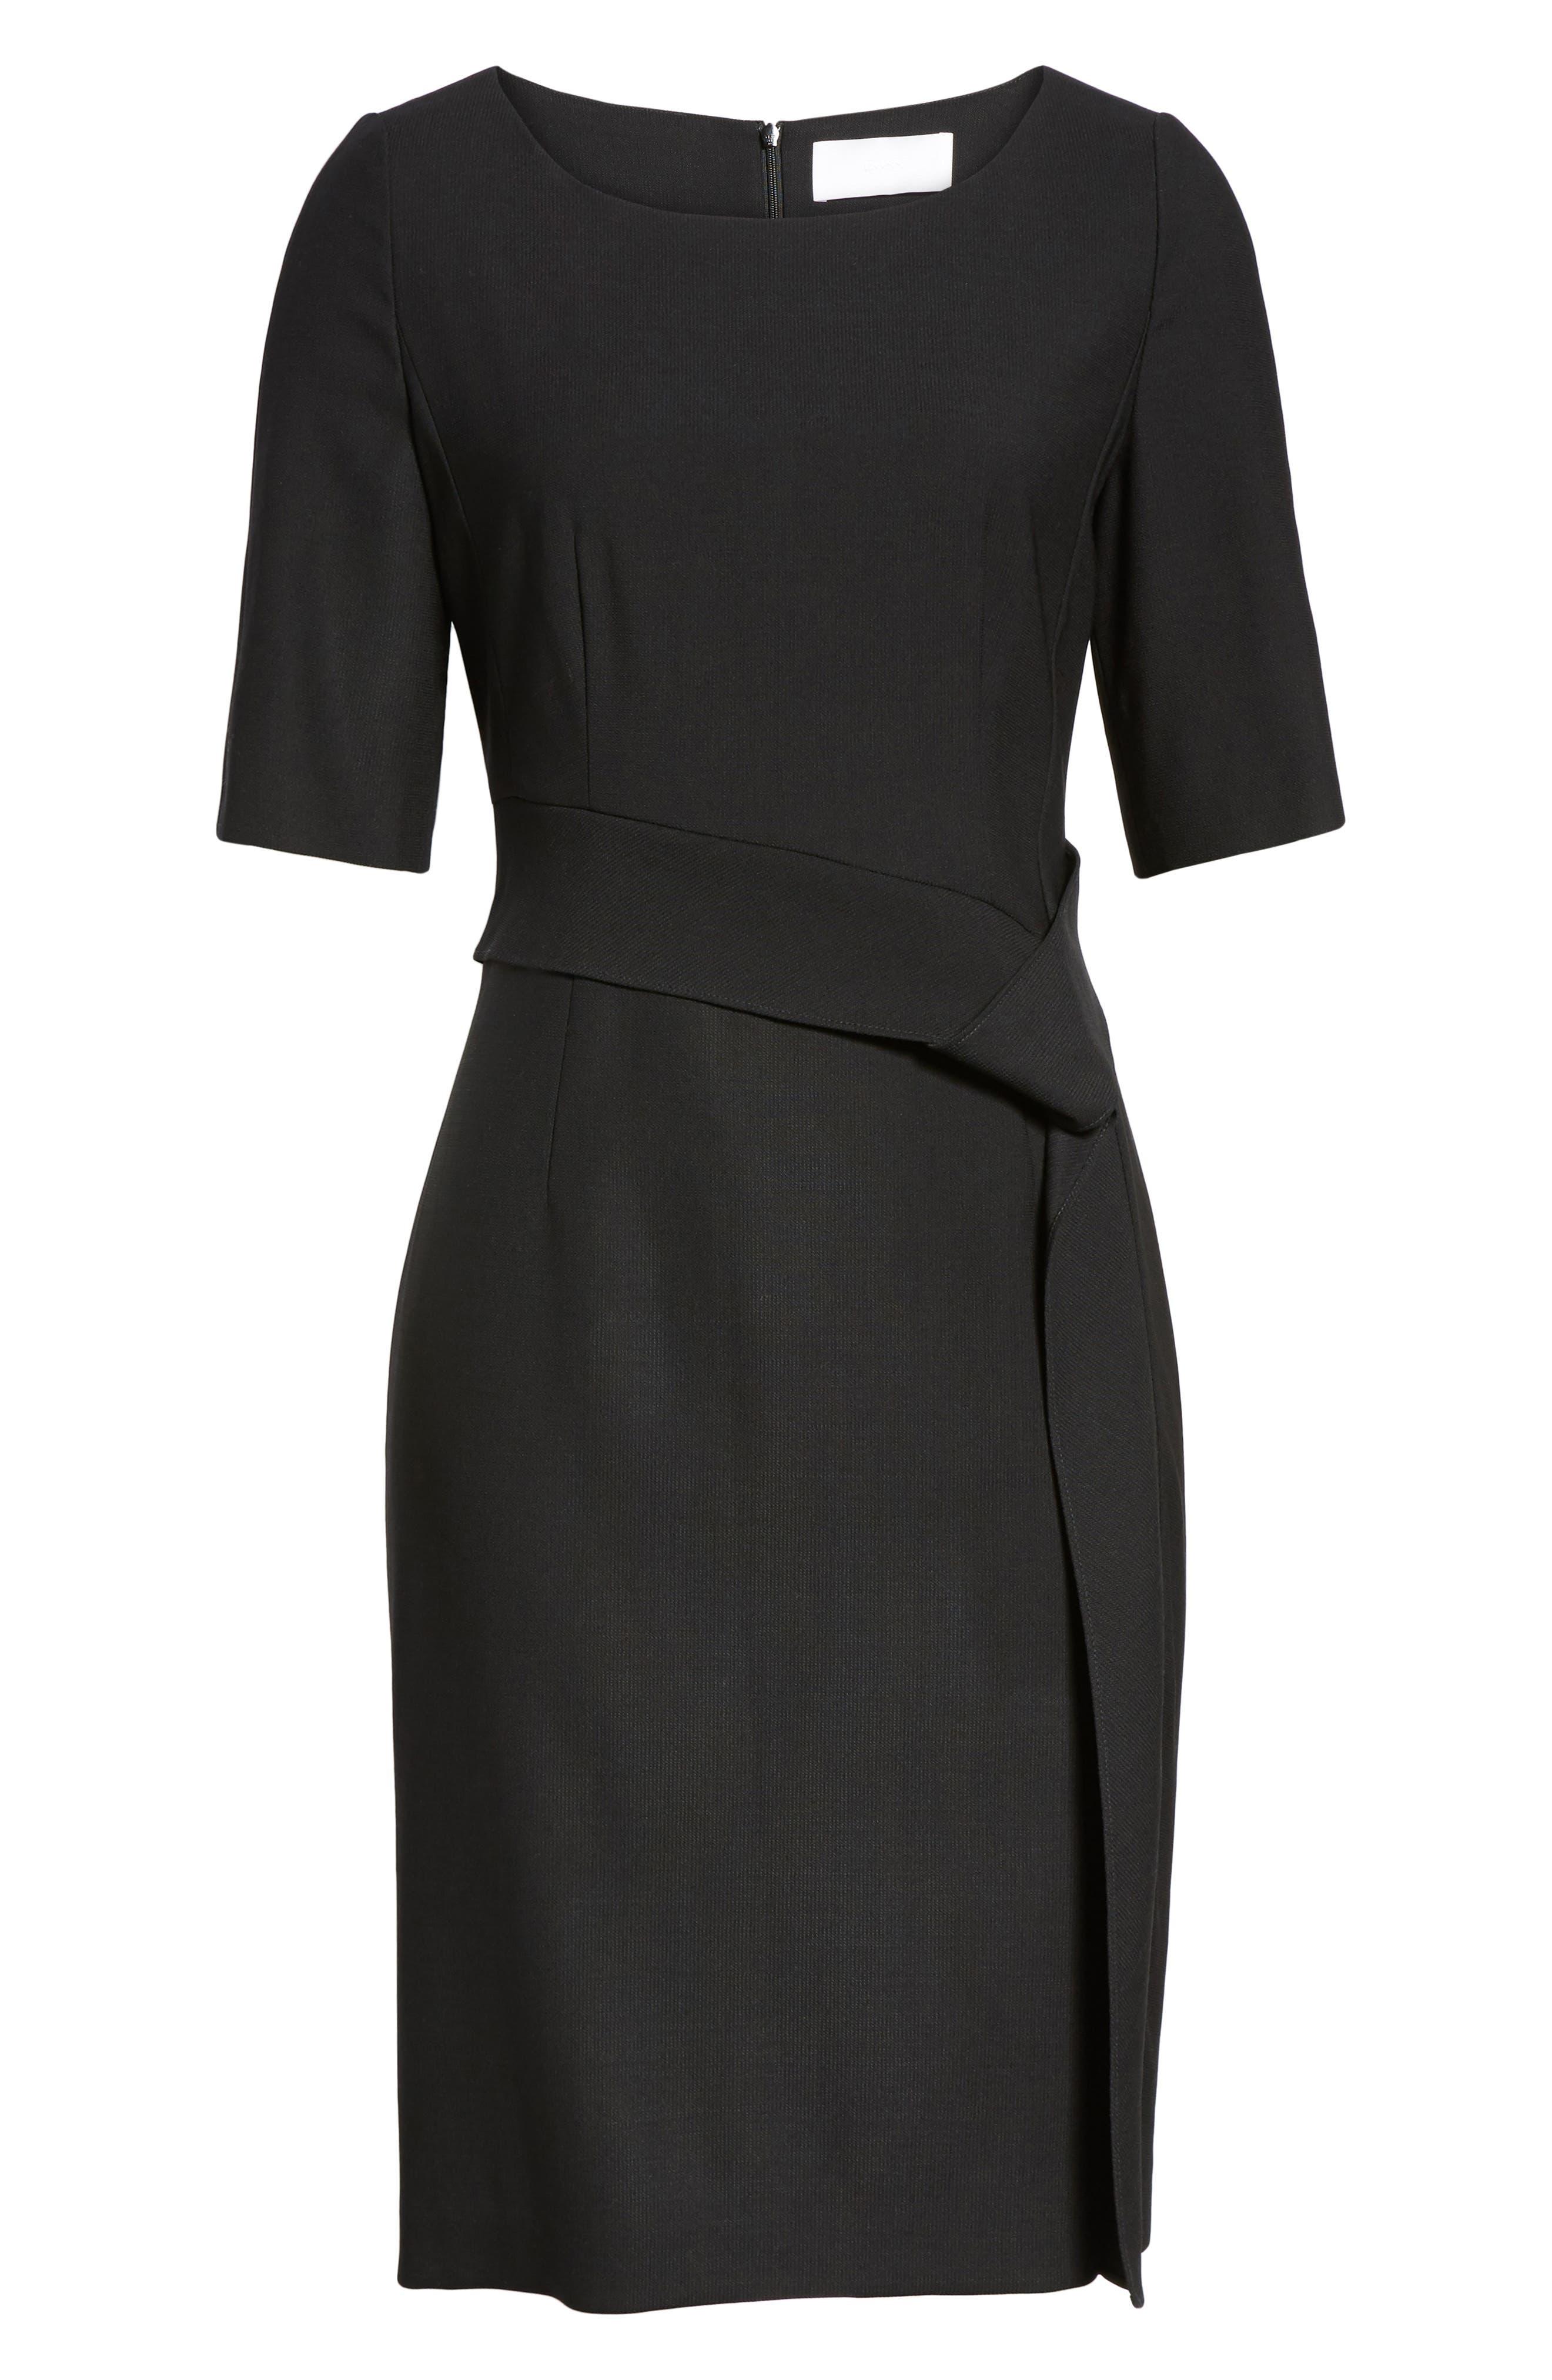 Delera Stretch Wool Sheath Dress,                             Alternate thumbnail 6, color,                             Black